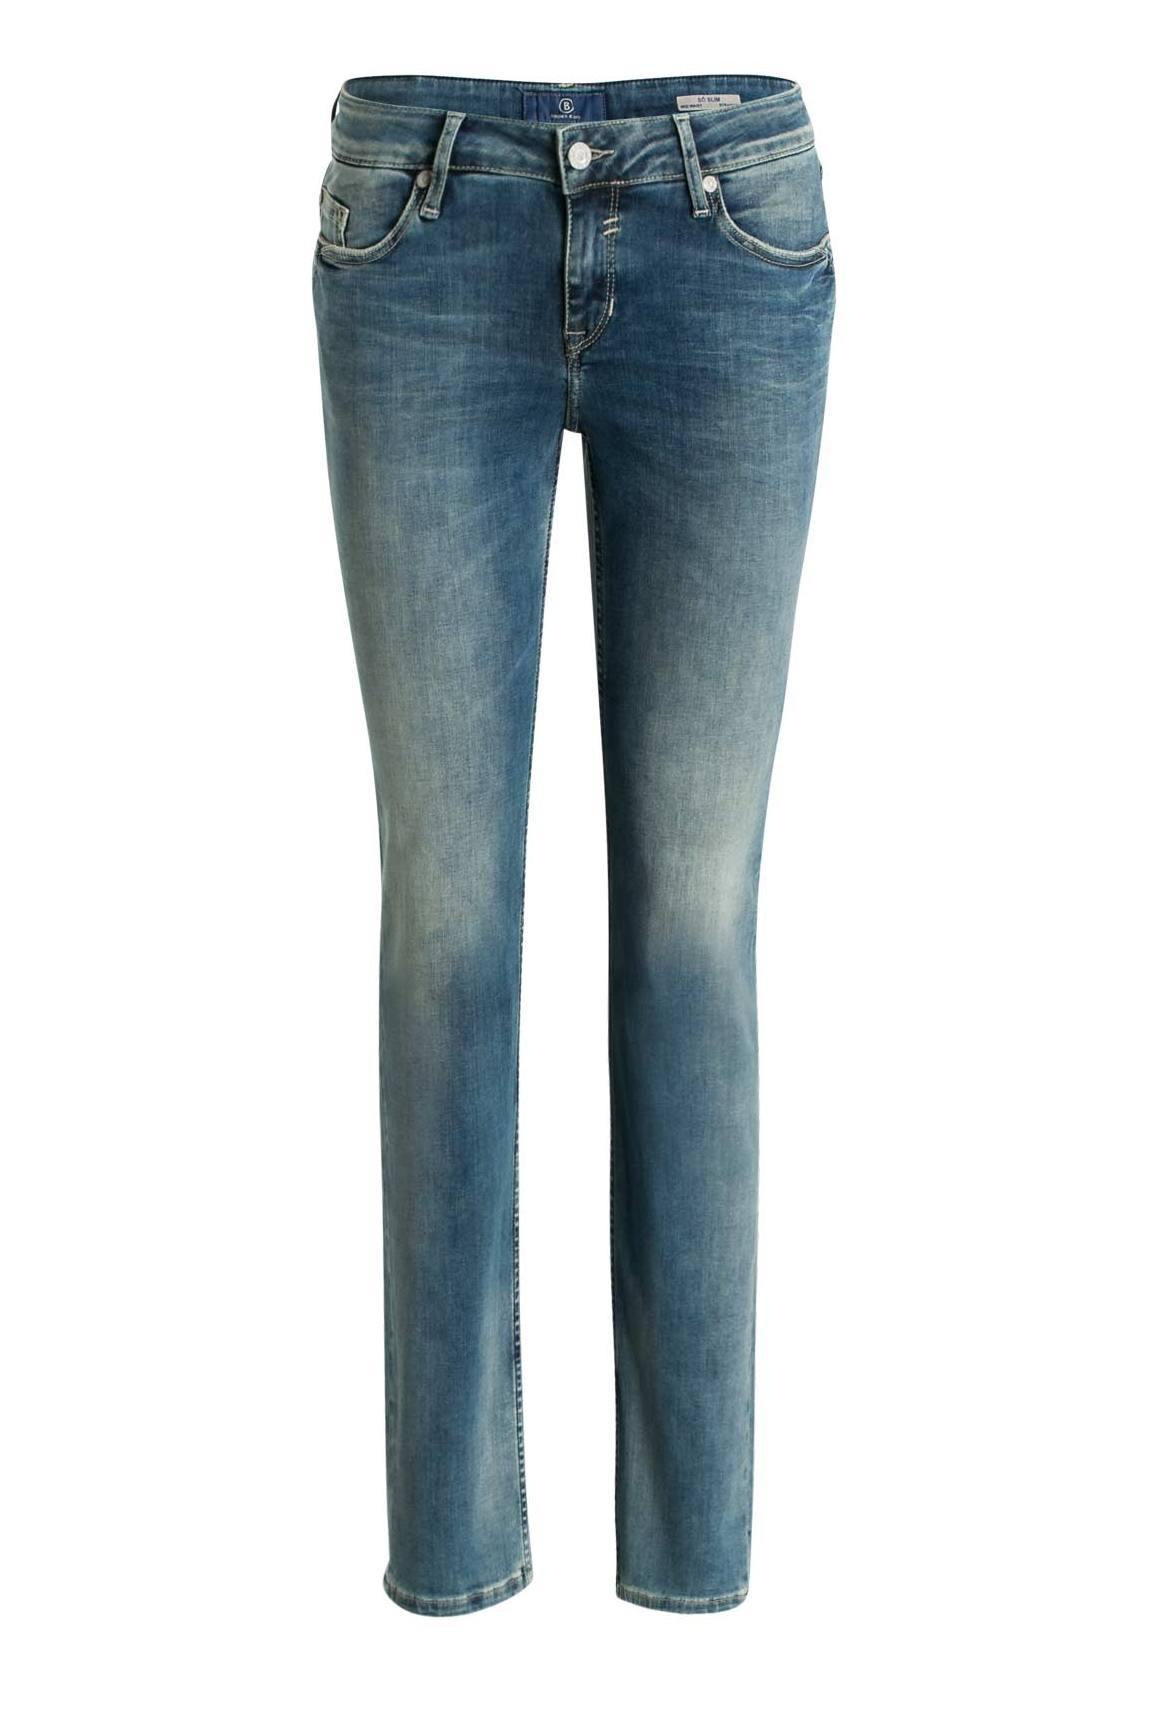 W31 L32 *WOW* Bogner Jeans So Slim Damen Jeans